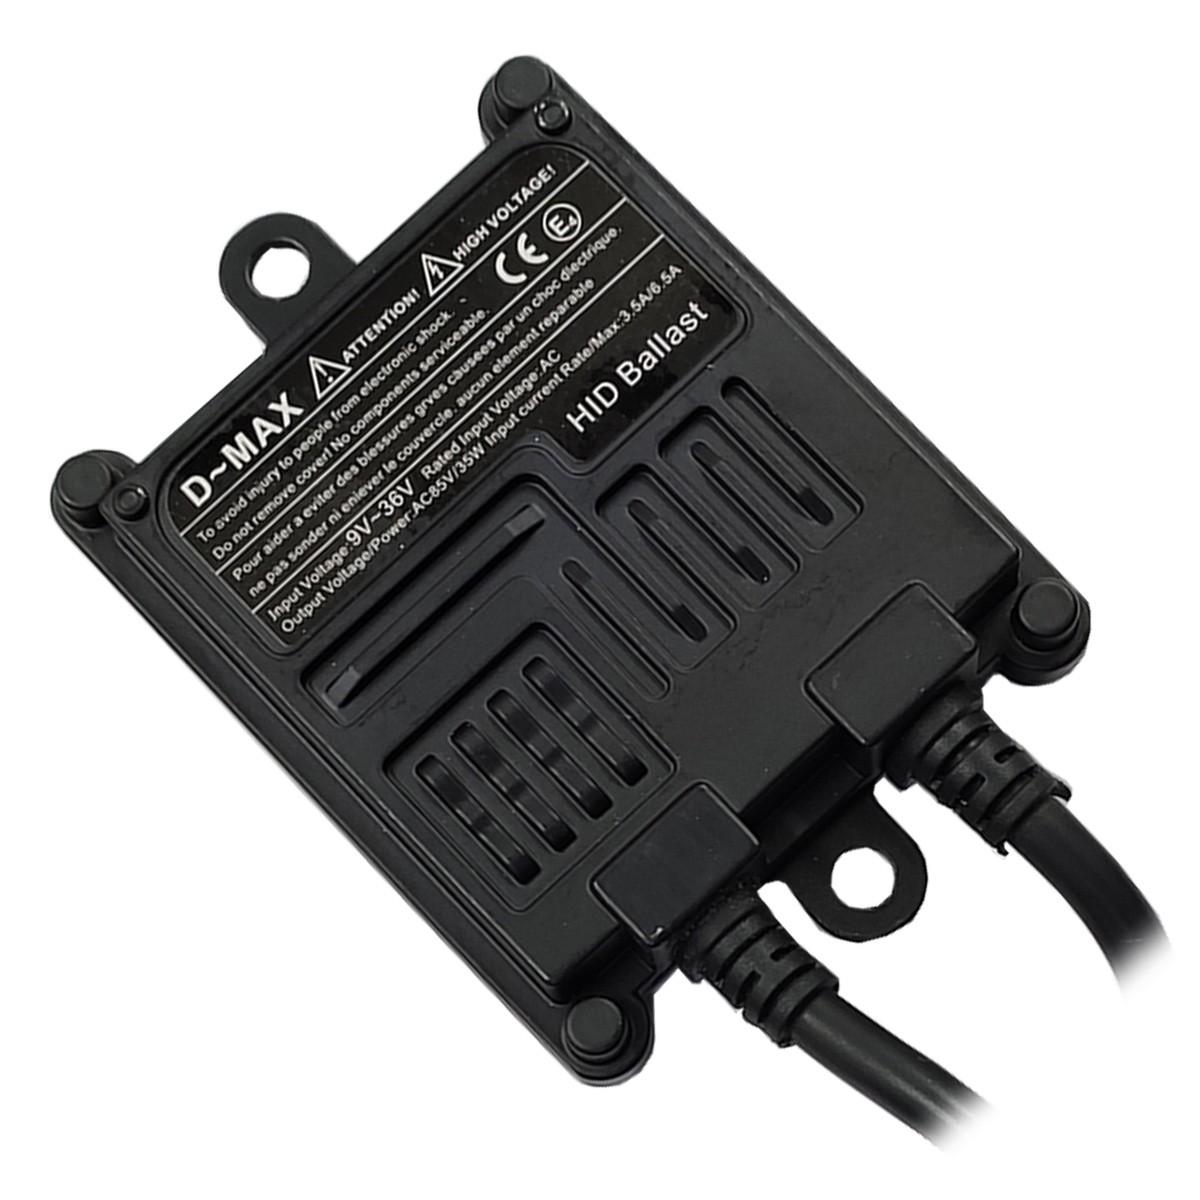 Kit BI-Xenon 24v